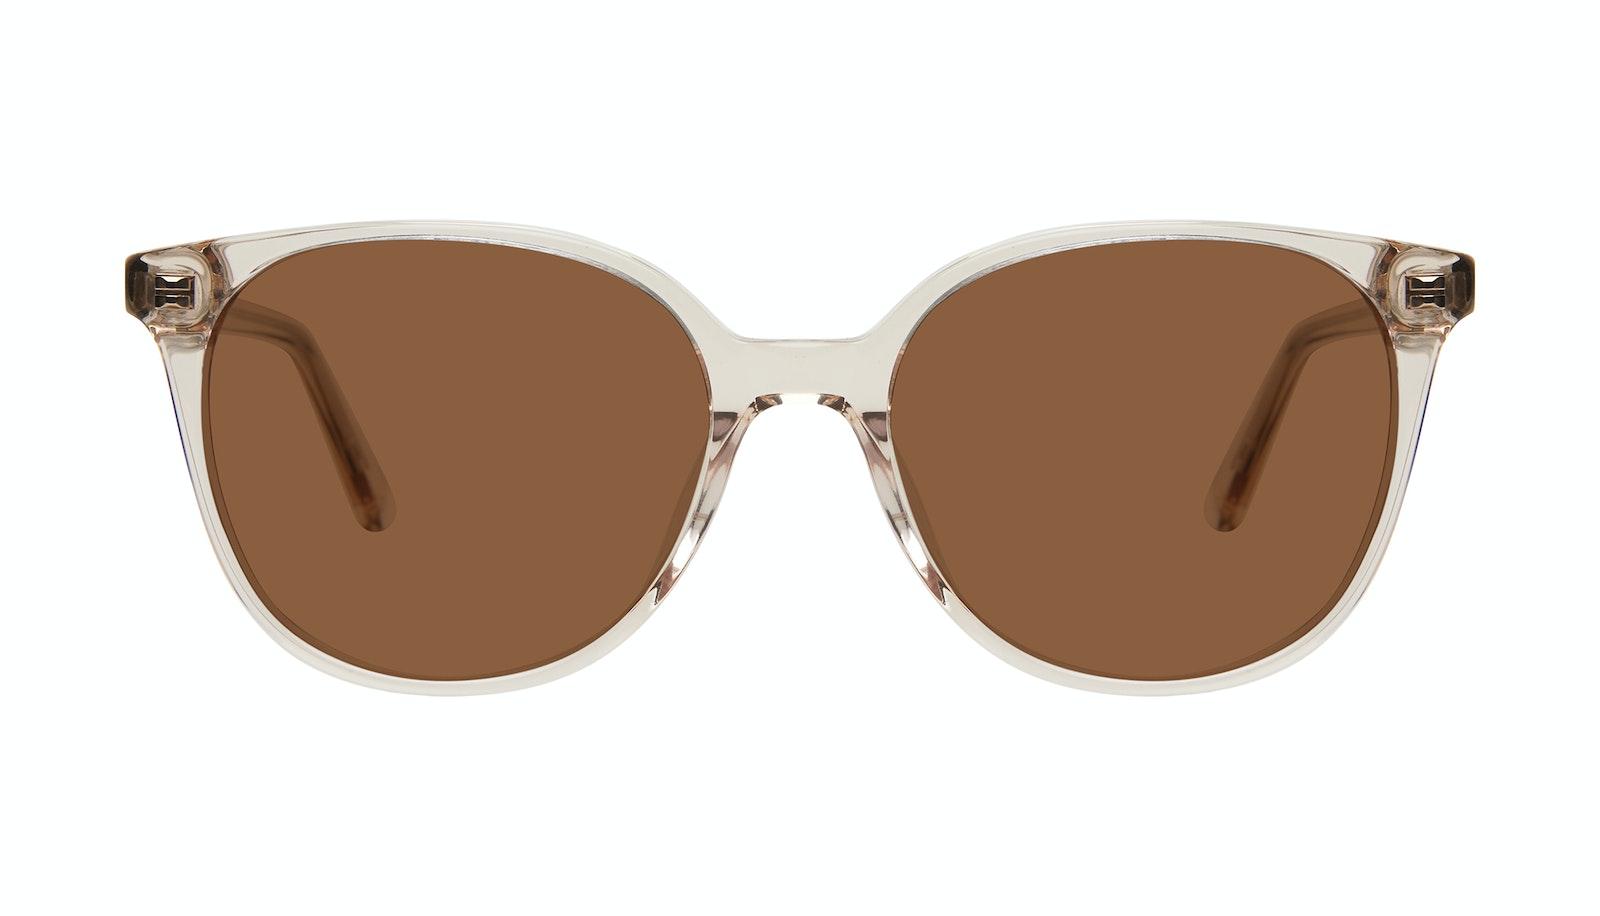 Affordable Fashion Glasses Square Sunglasses Women Novel Blond